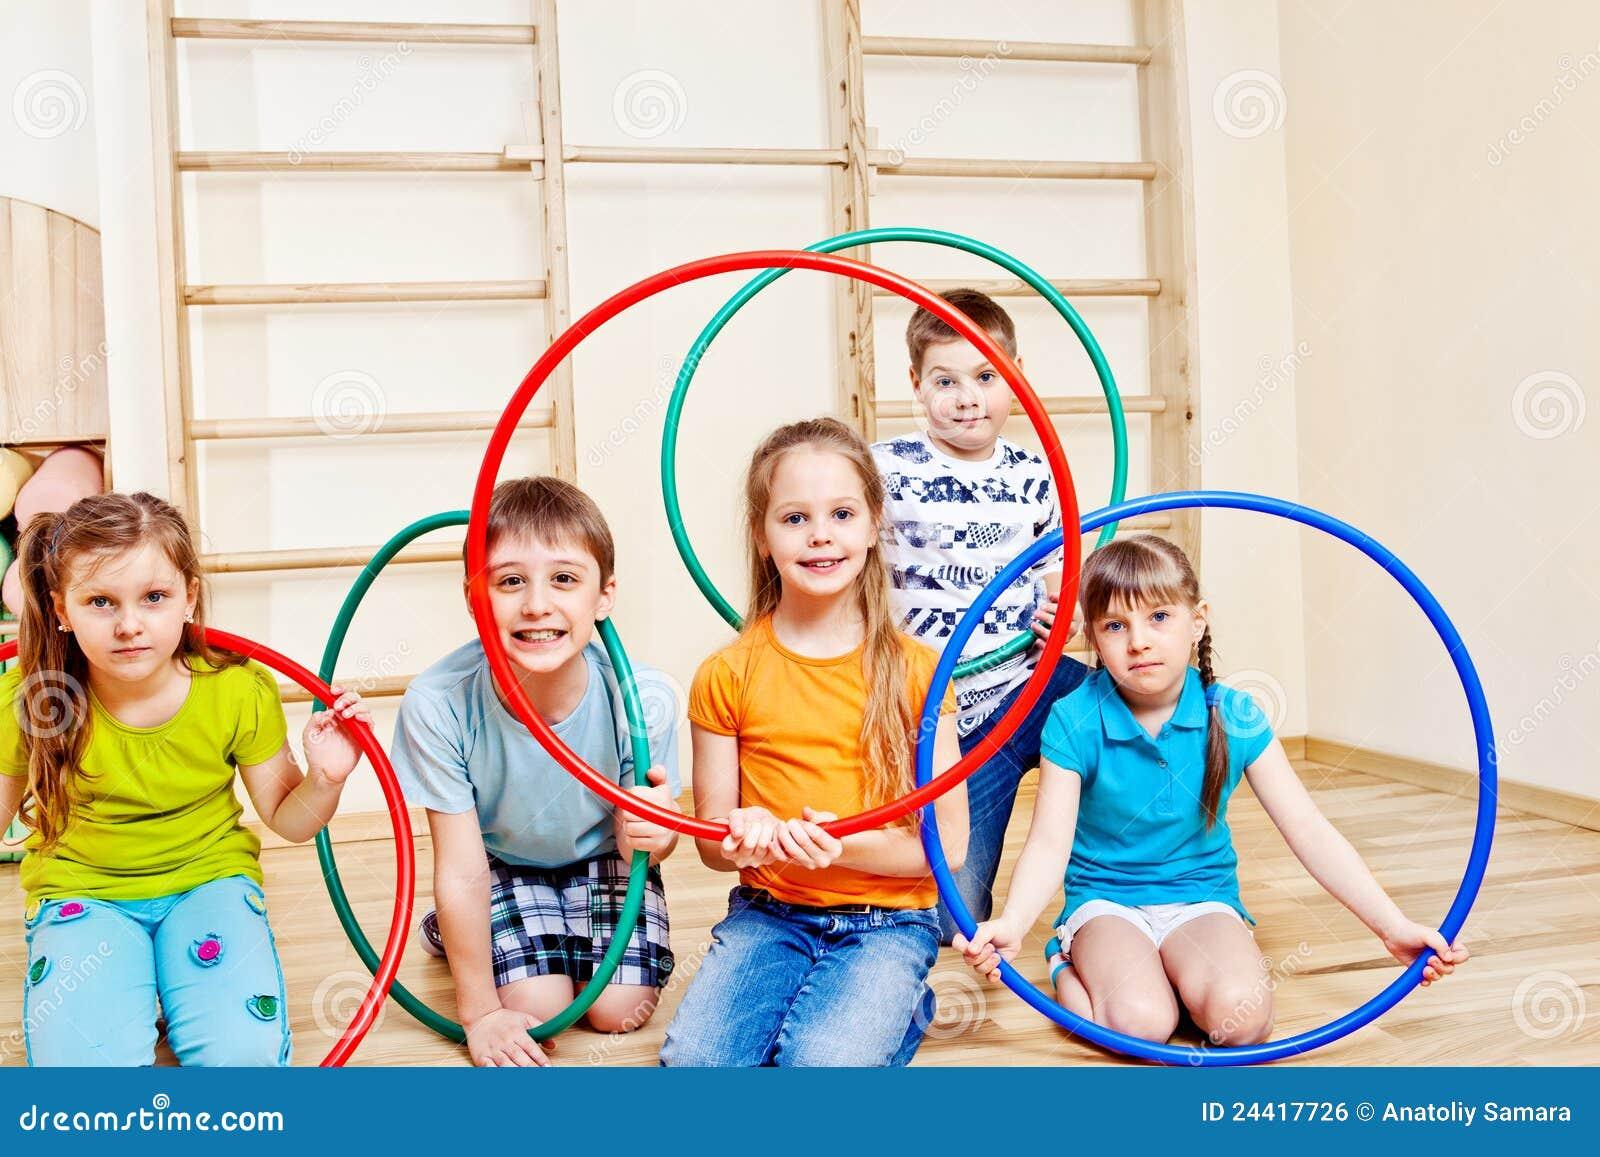 Kids with hula hoops